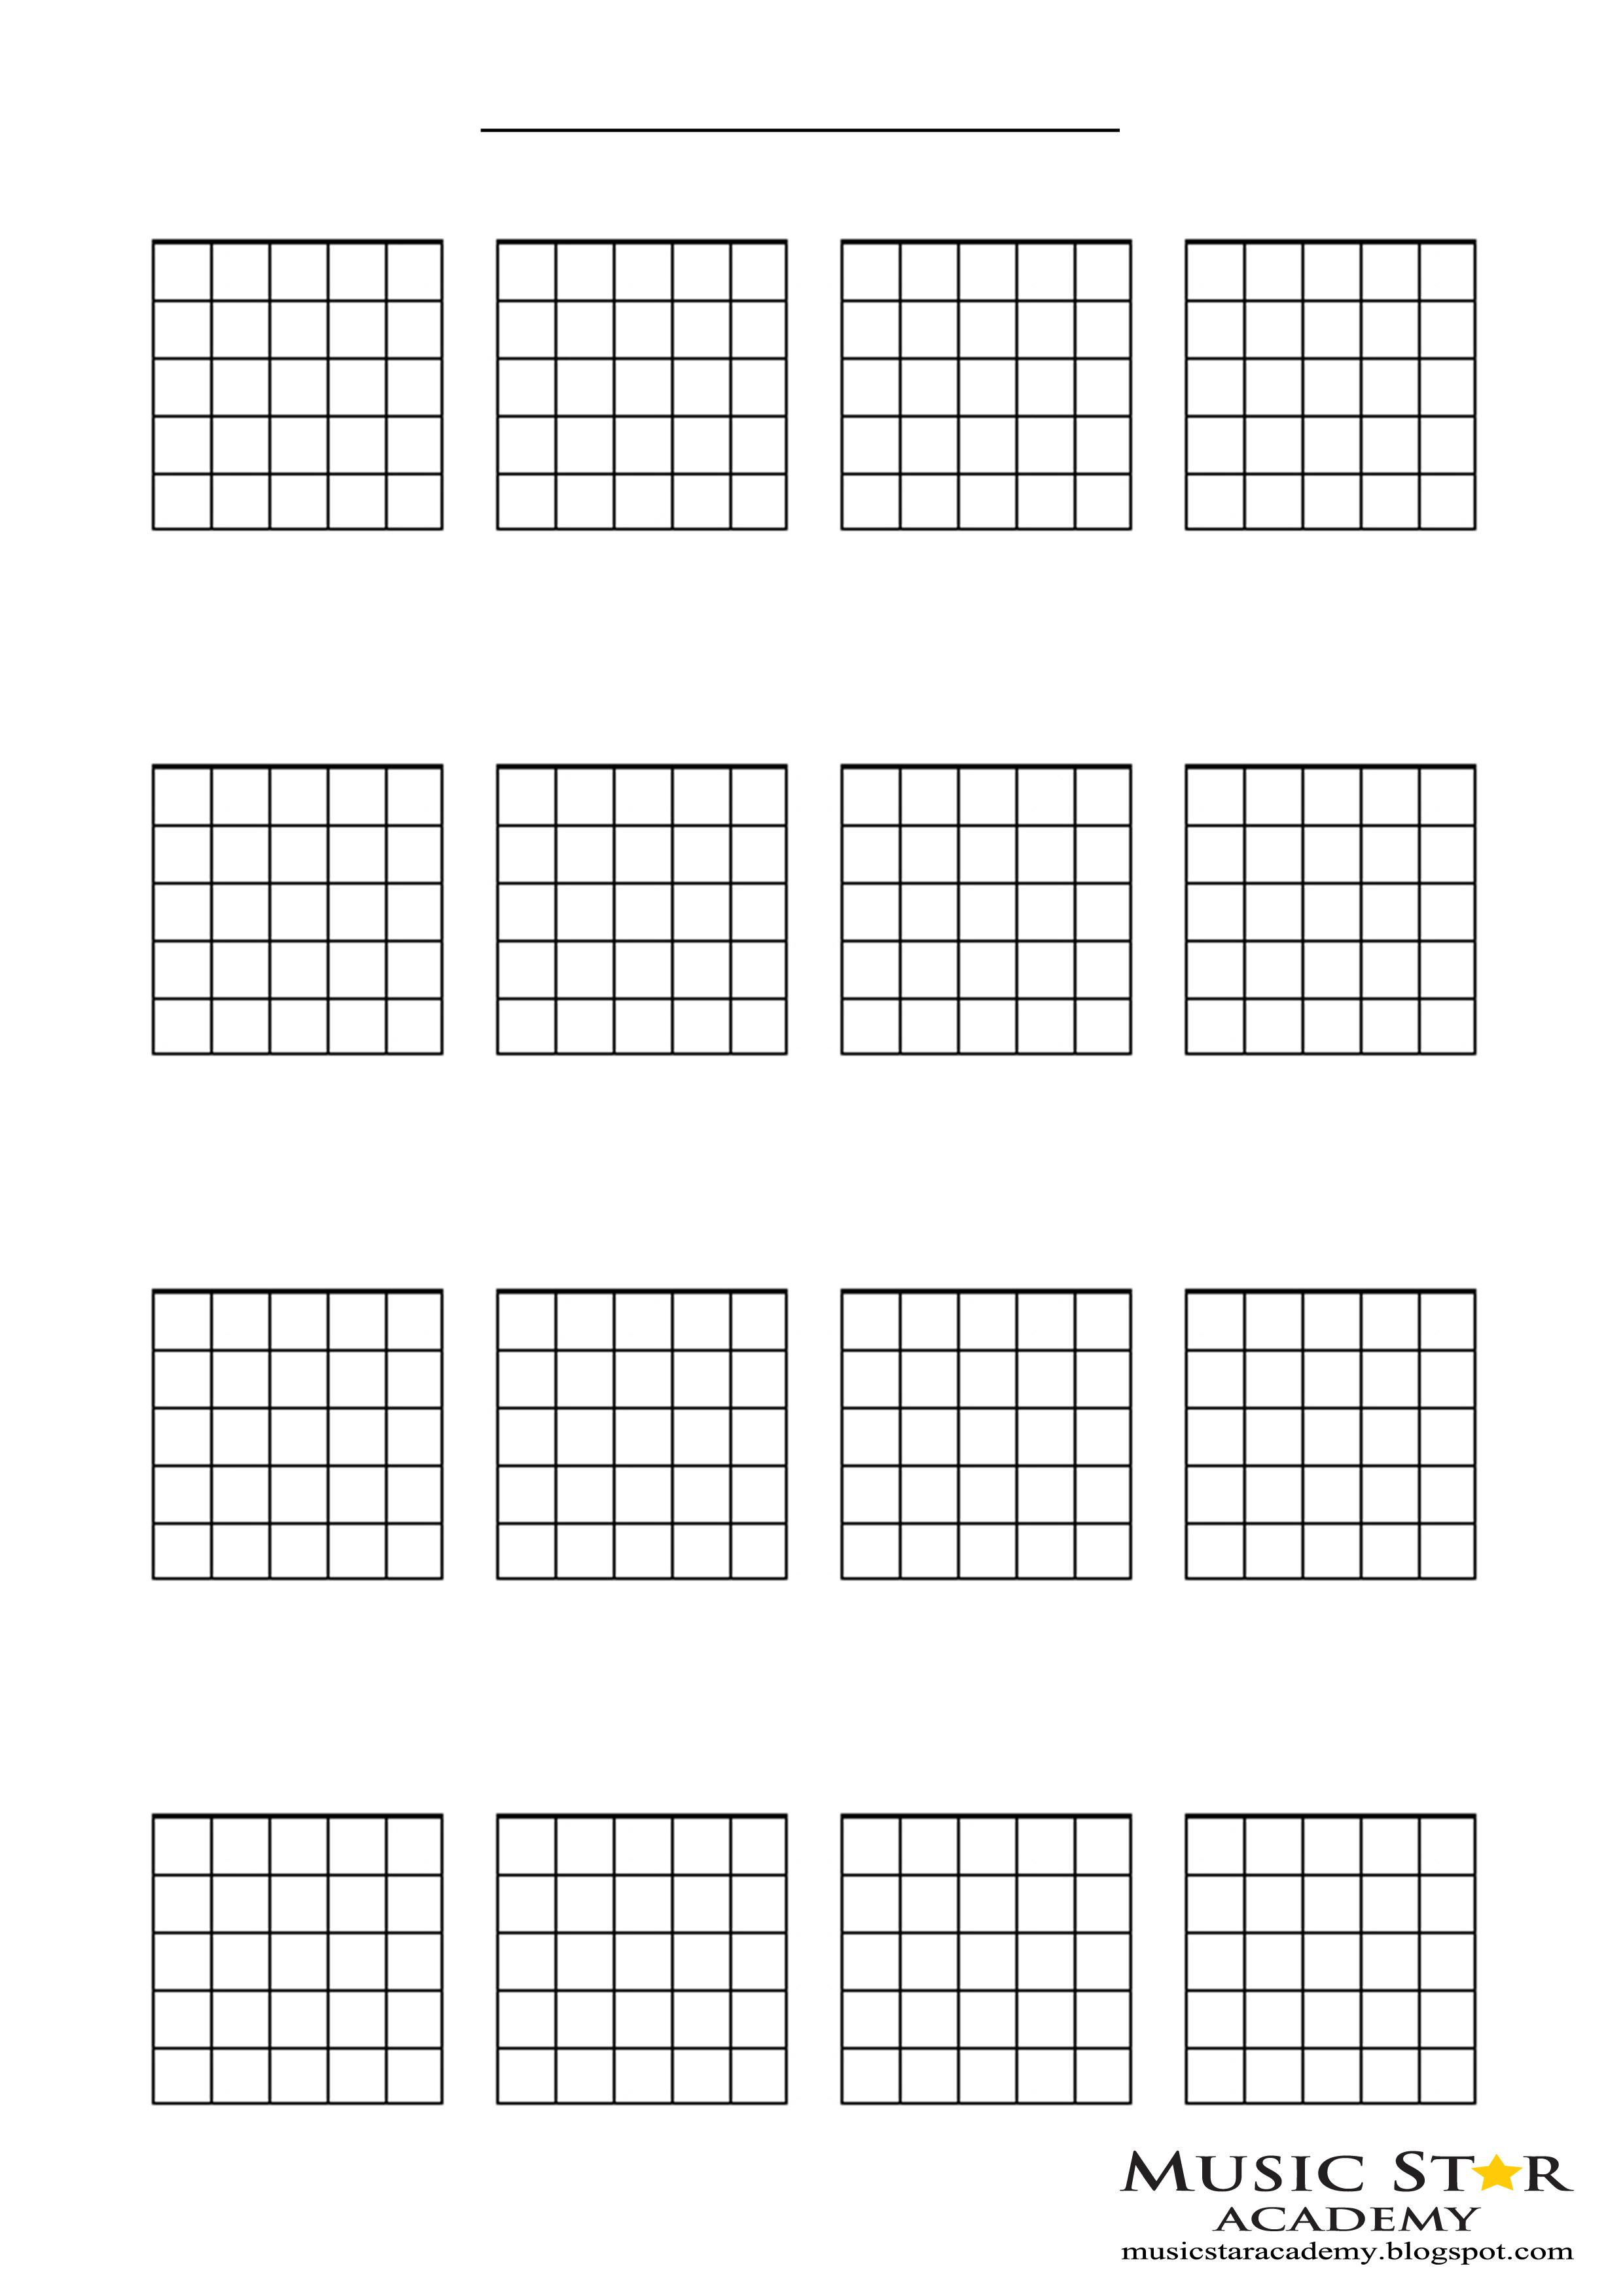 blank mandolin fretboard diagram 2000 nissan frontier ac wiring search results for guitar tab sheets  calendar 2015